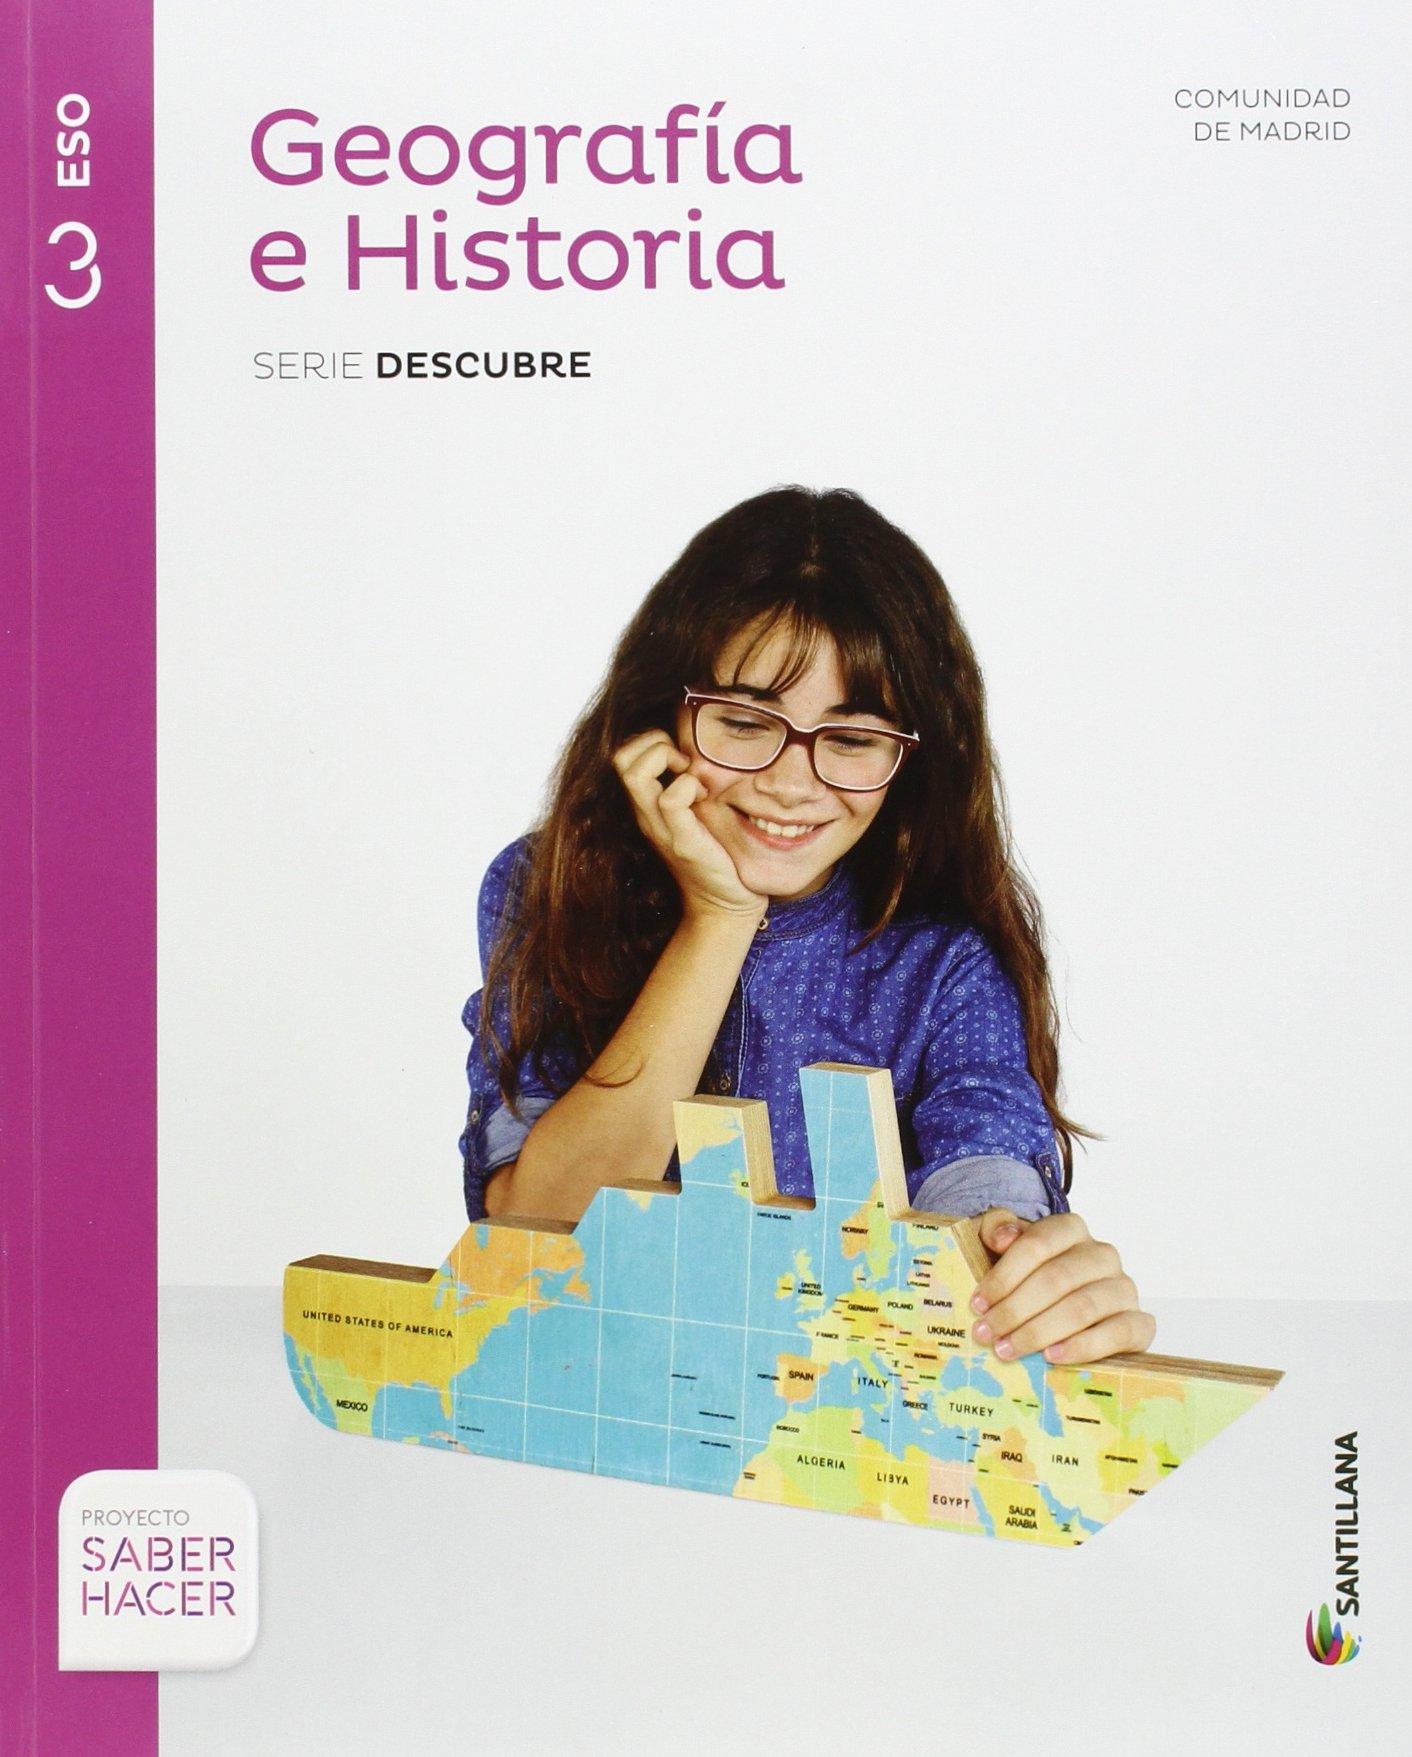 GEOGRAFIA E HISTORIA MADRID SERIE DESCUBRE 3 ESO SABER HACER - 9788468033150: Amazon.es: Aa.Vv.: Libros